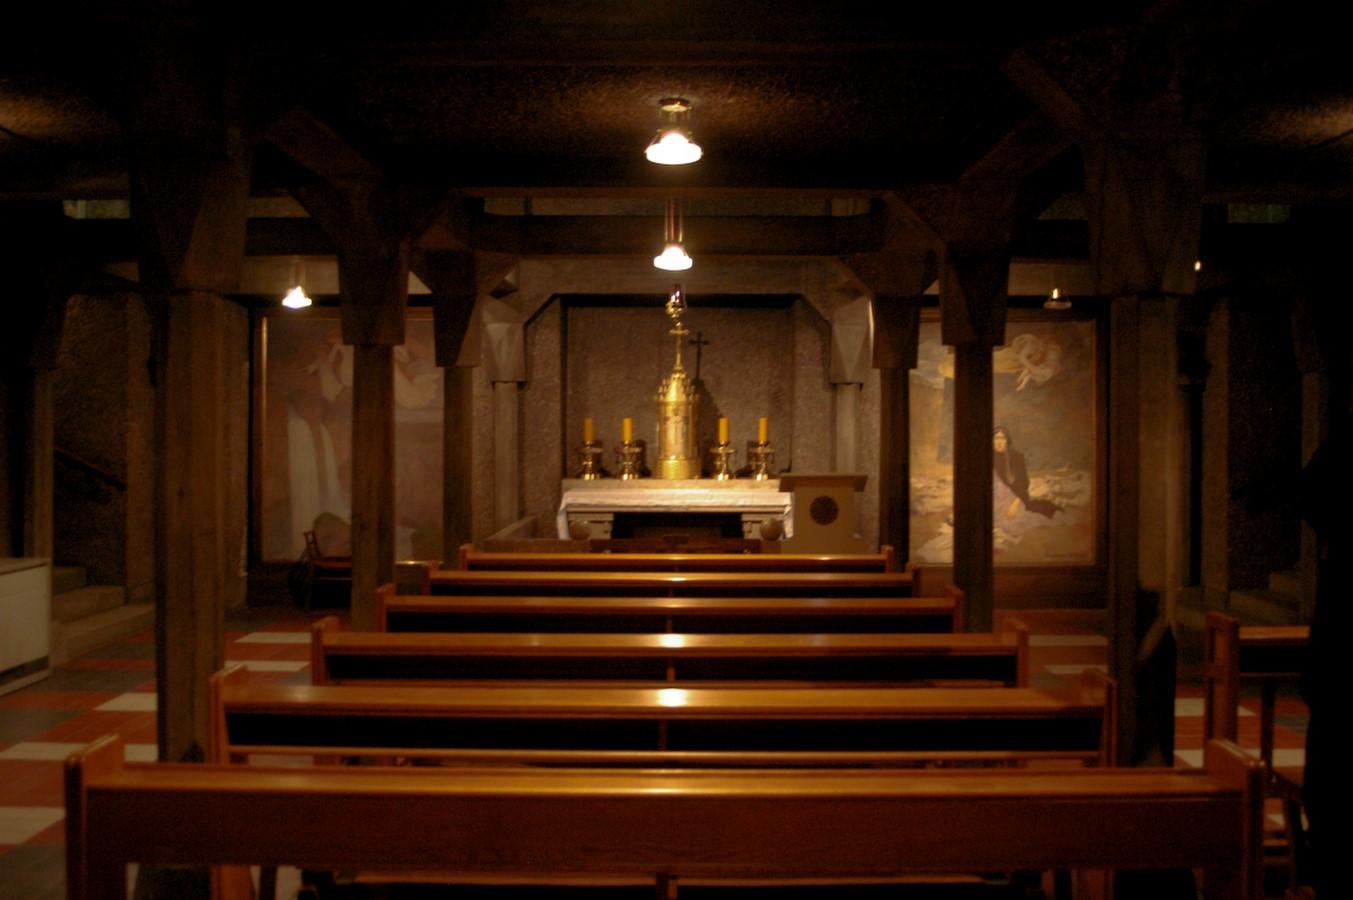 Church of Holy Spirit, Herbststraße 78, 1160 Wien, Austria - Sheet2